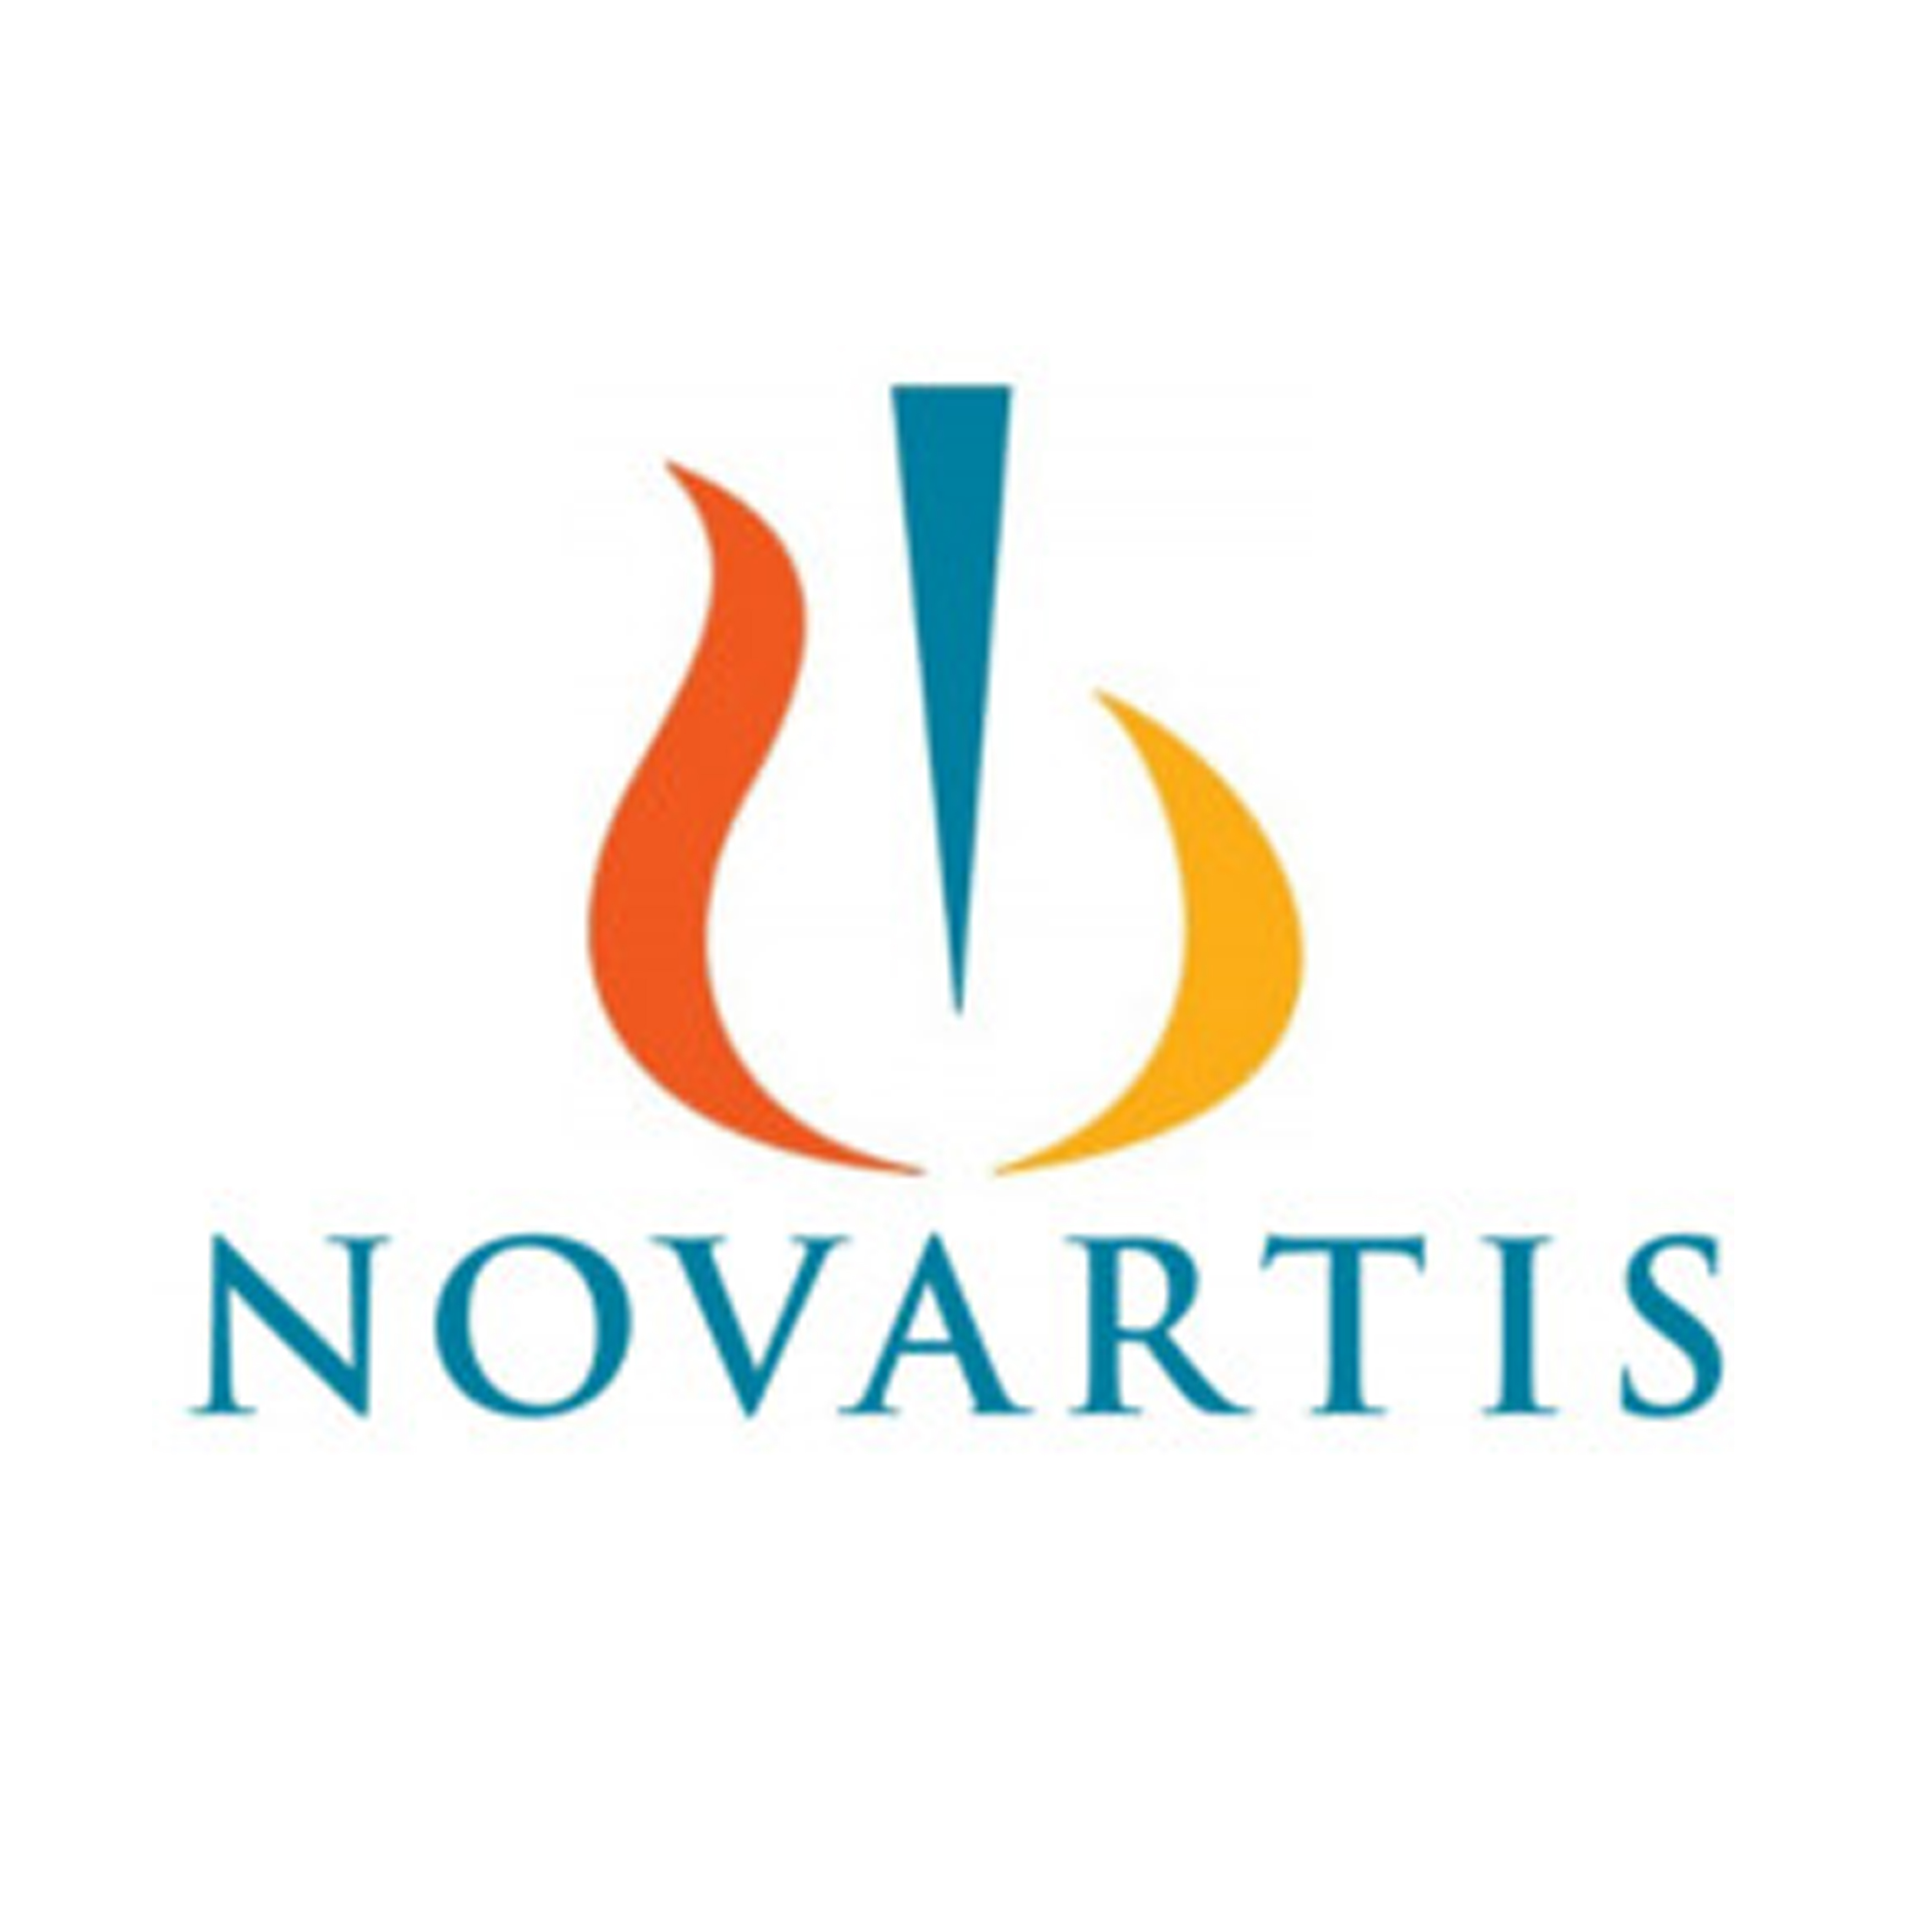 Novartis 3.png